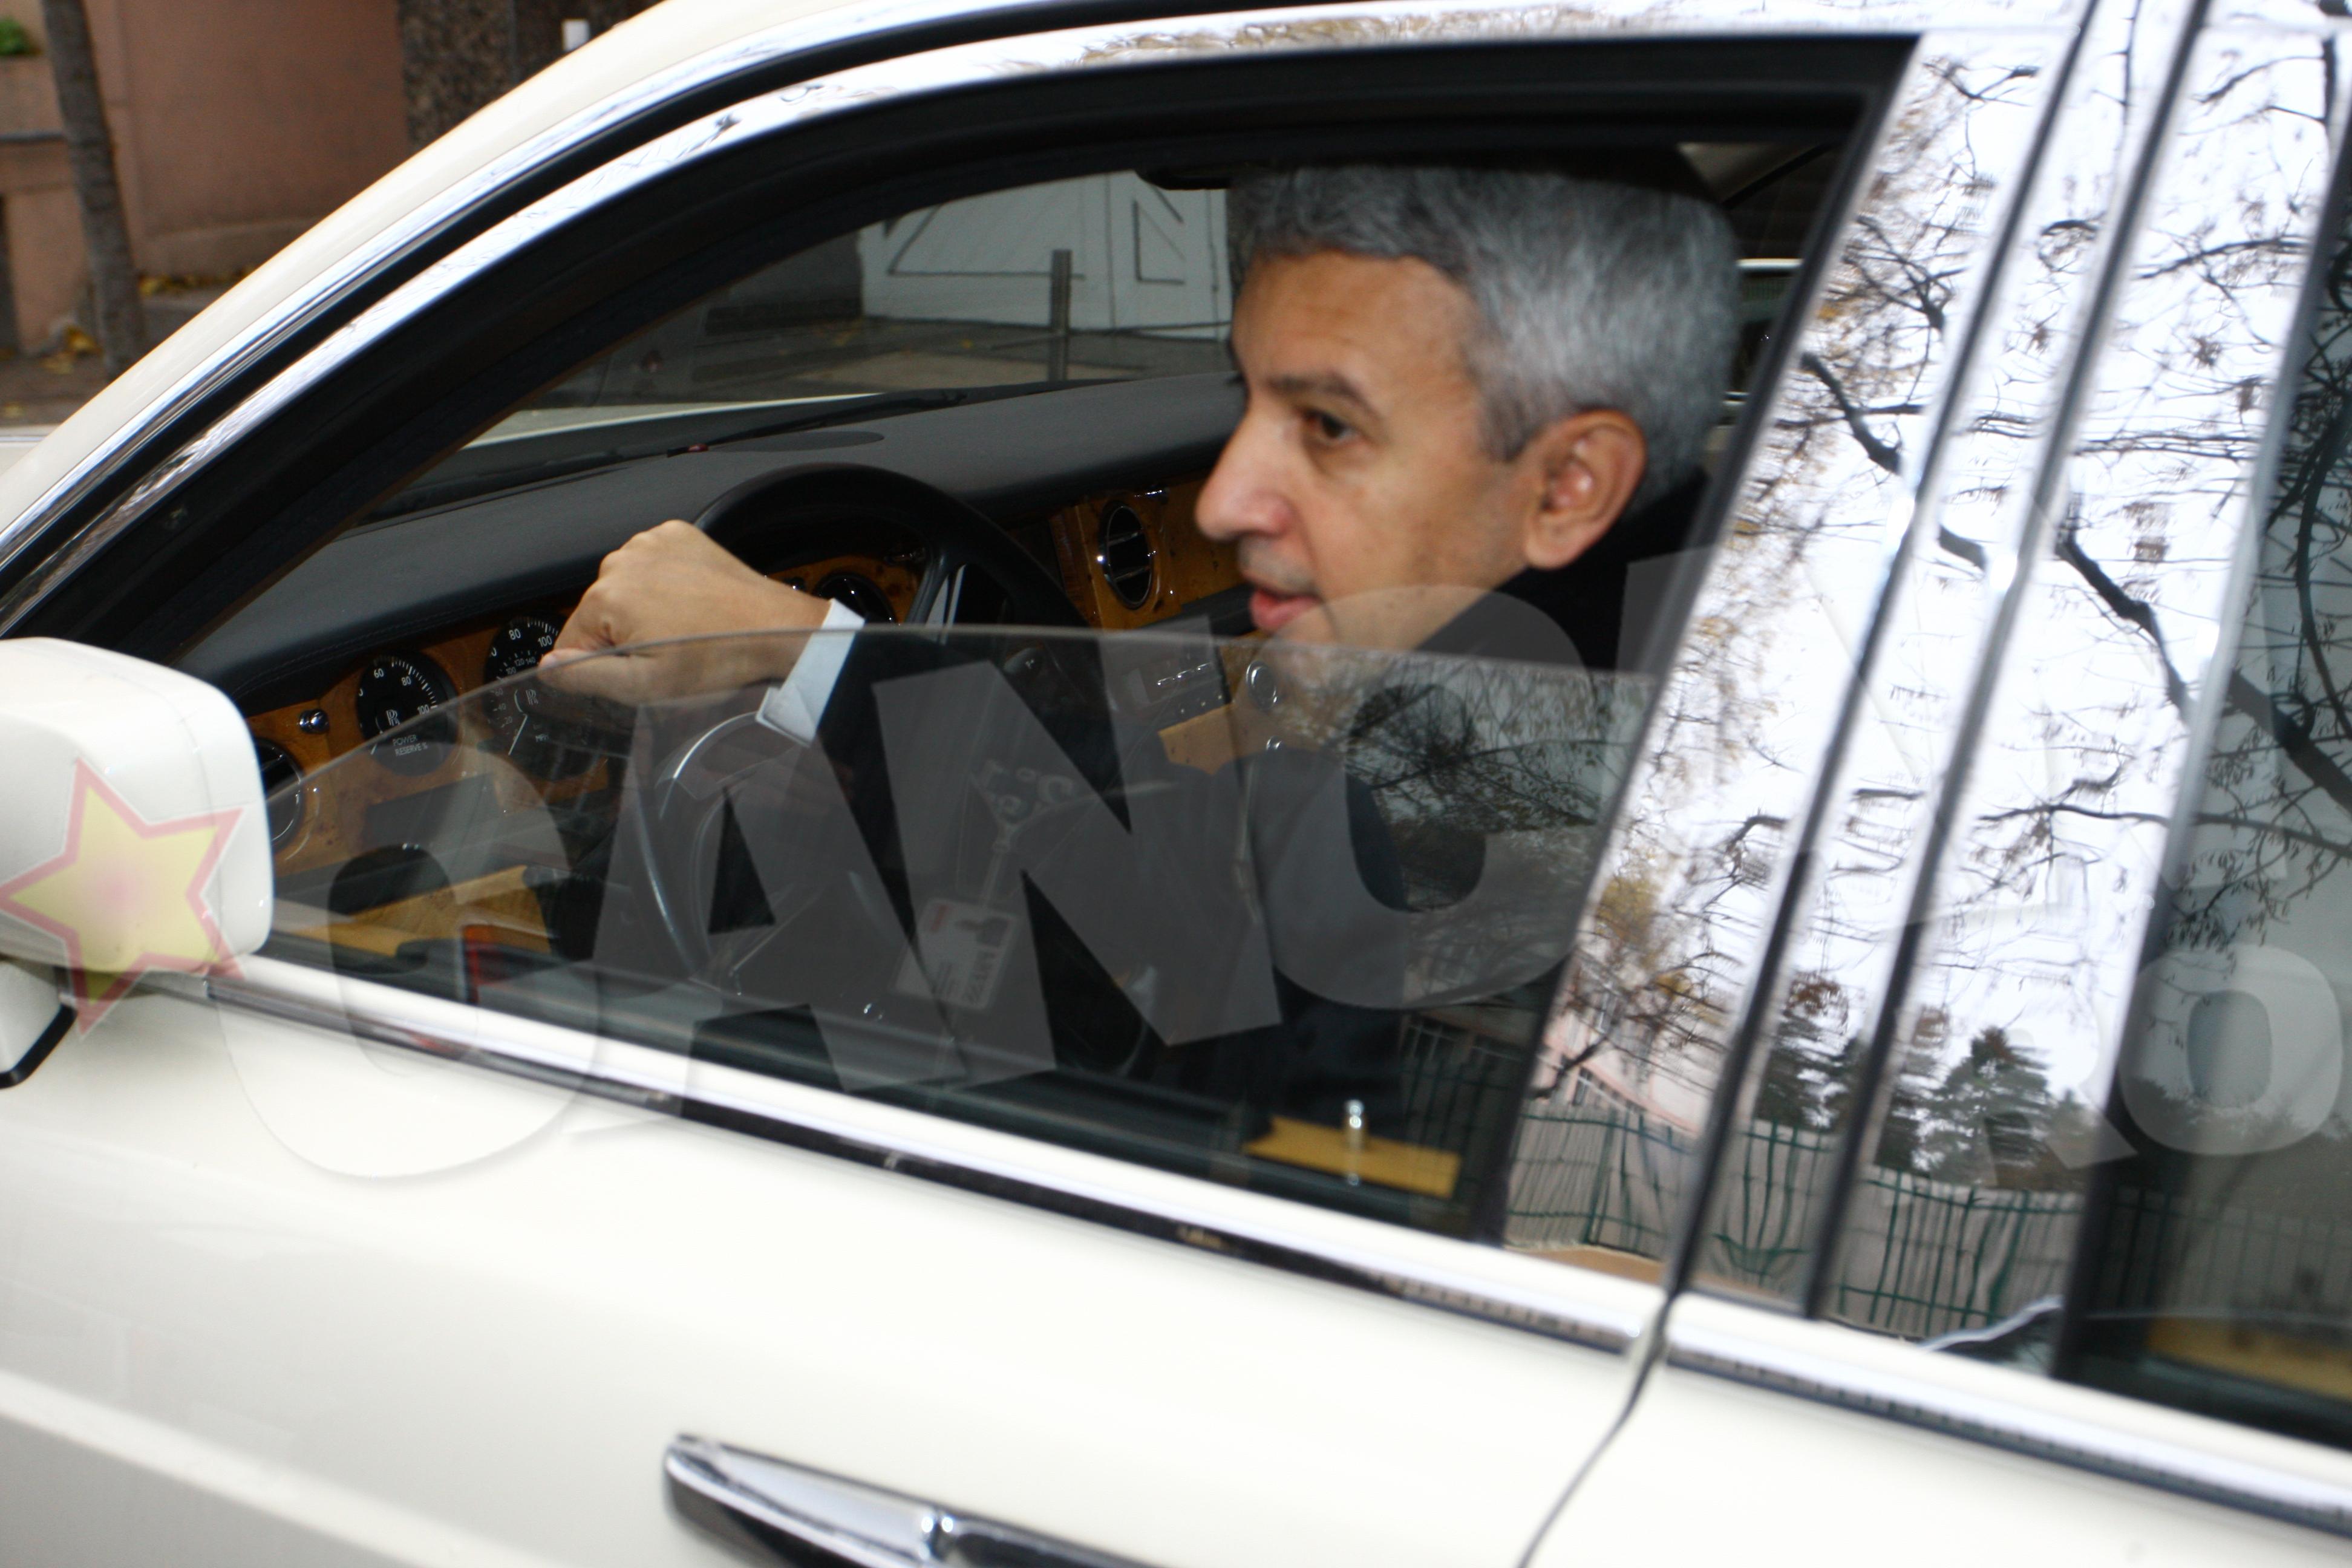 Dupa ce a votat, Diaconescu a stat de vorba cu jurnalistii